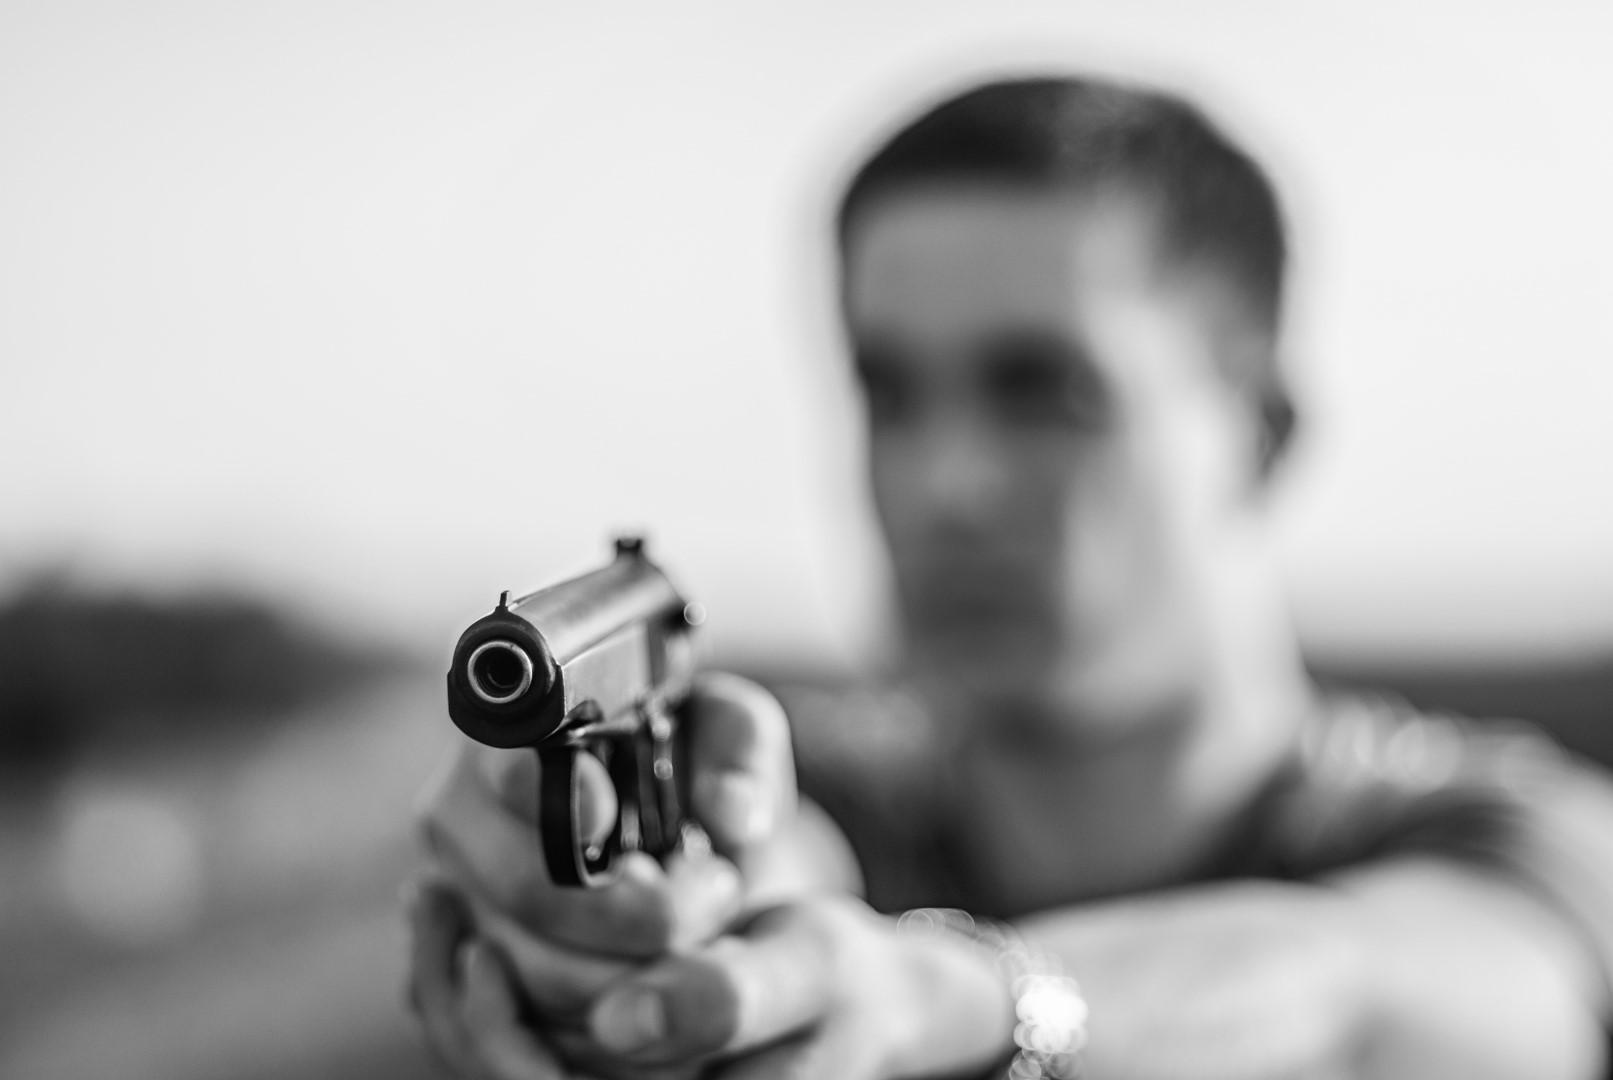 gun-violence-06.17-Large.jpg